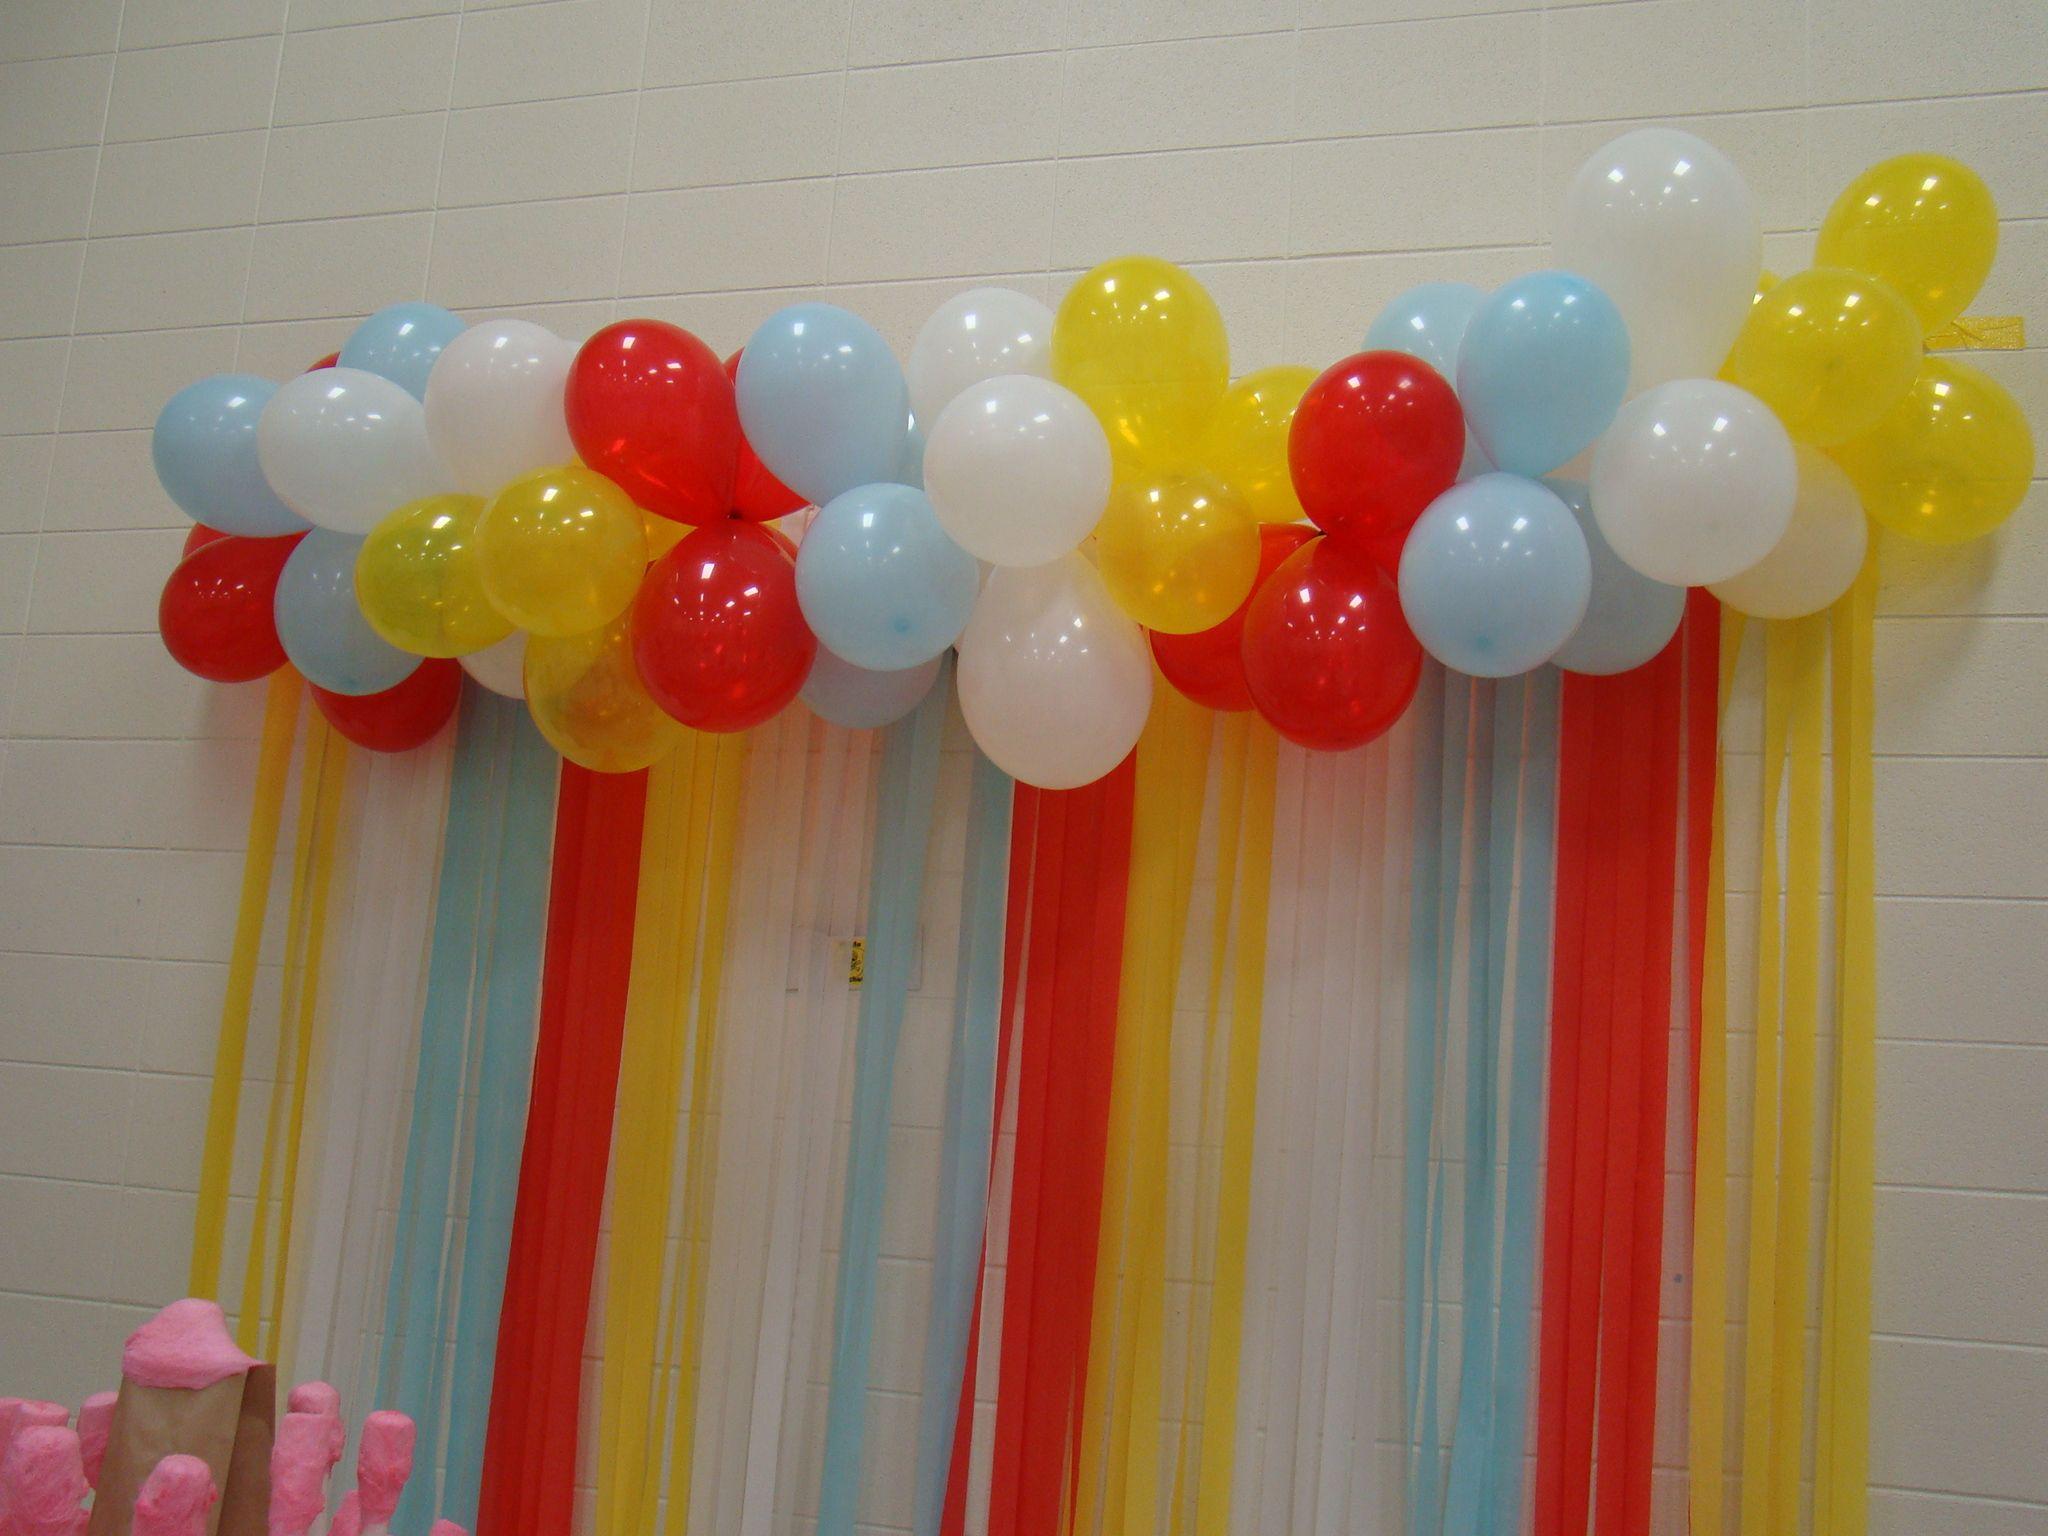 Balloon banner streamer backdrop for preschool for How to make a balloon and streamer backdrop